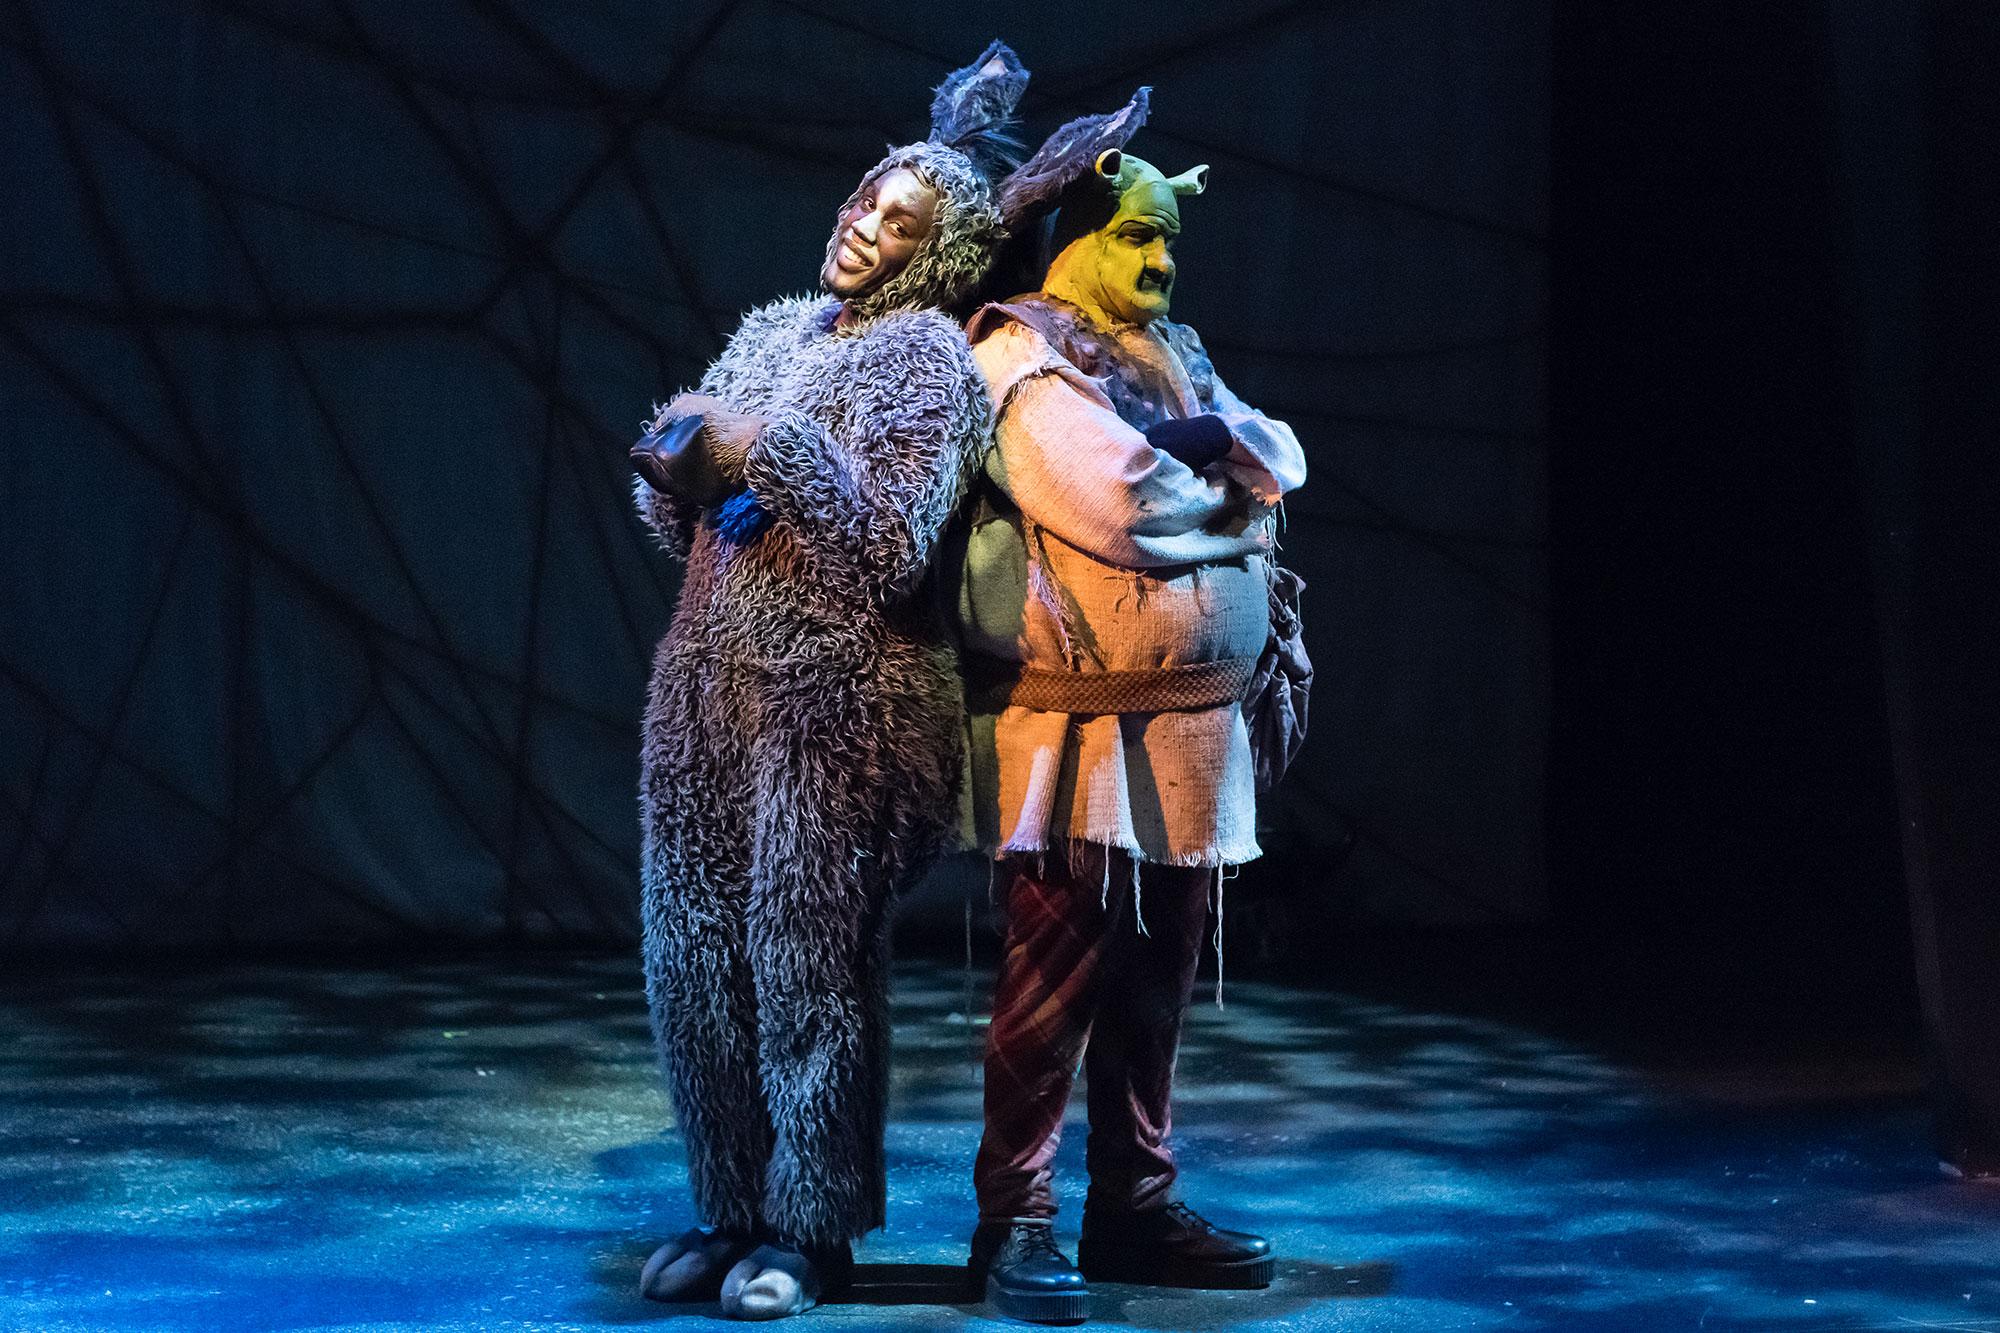 Remell-Bowens-(Donkey)-and-Gilgamesh-Taggett-(Shrek),-Photo-Credit-Andy-Dudik.jpg